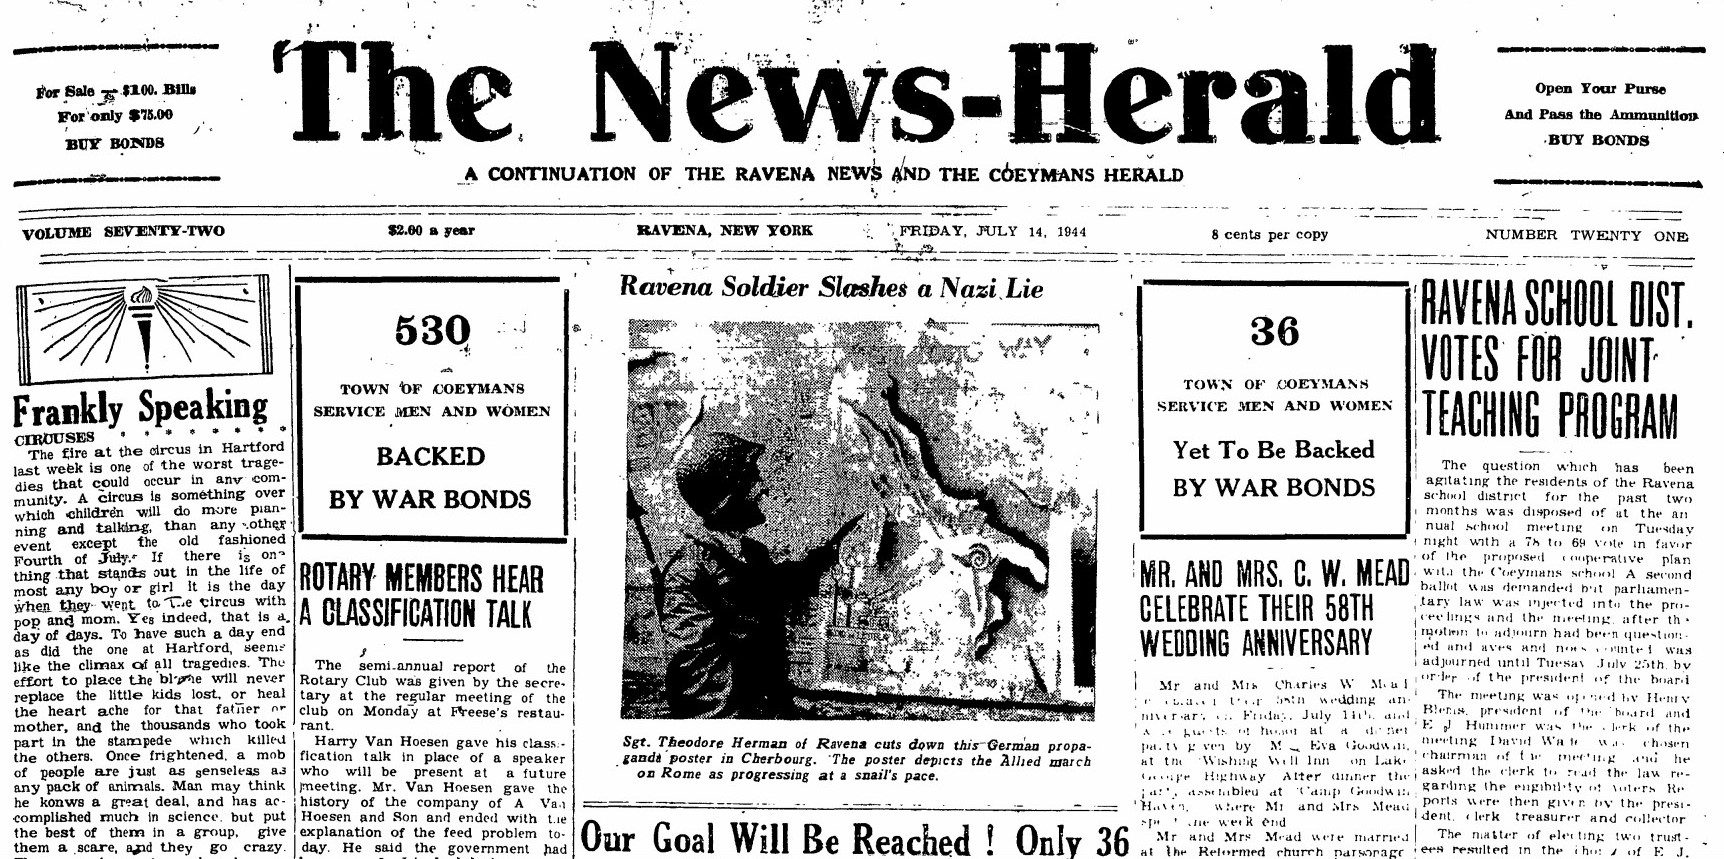 The News-Herald -Ravena soldier